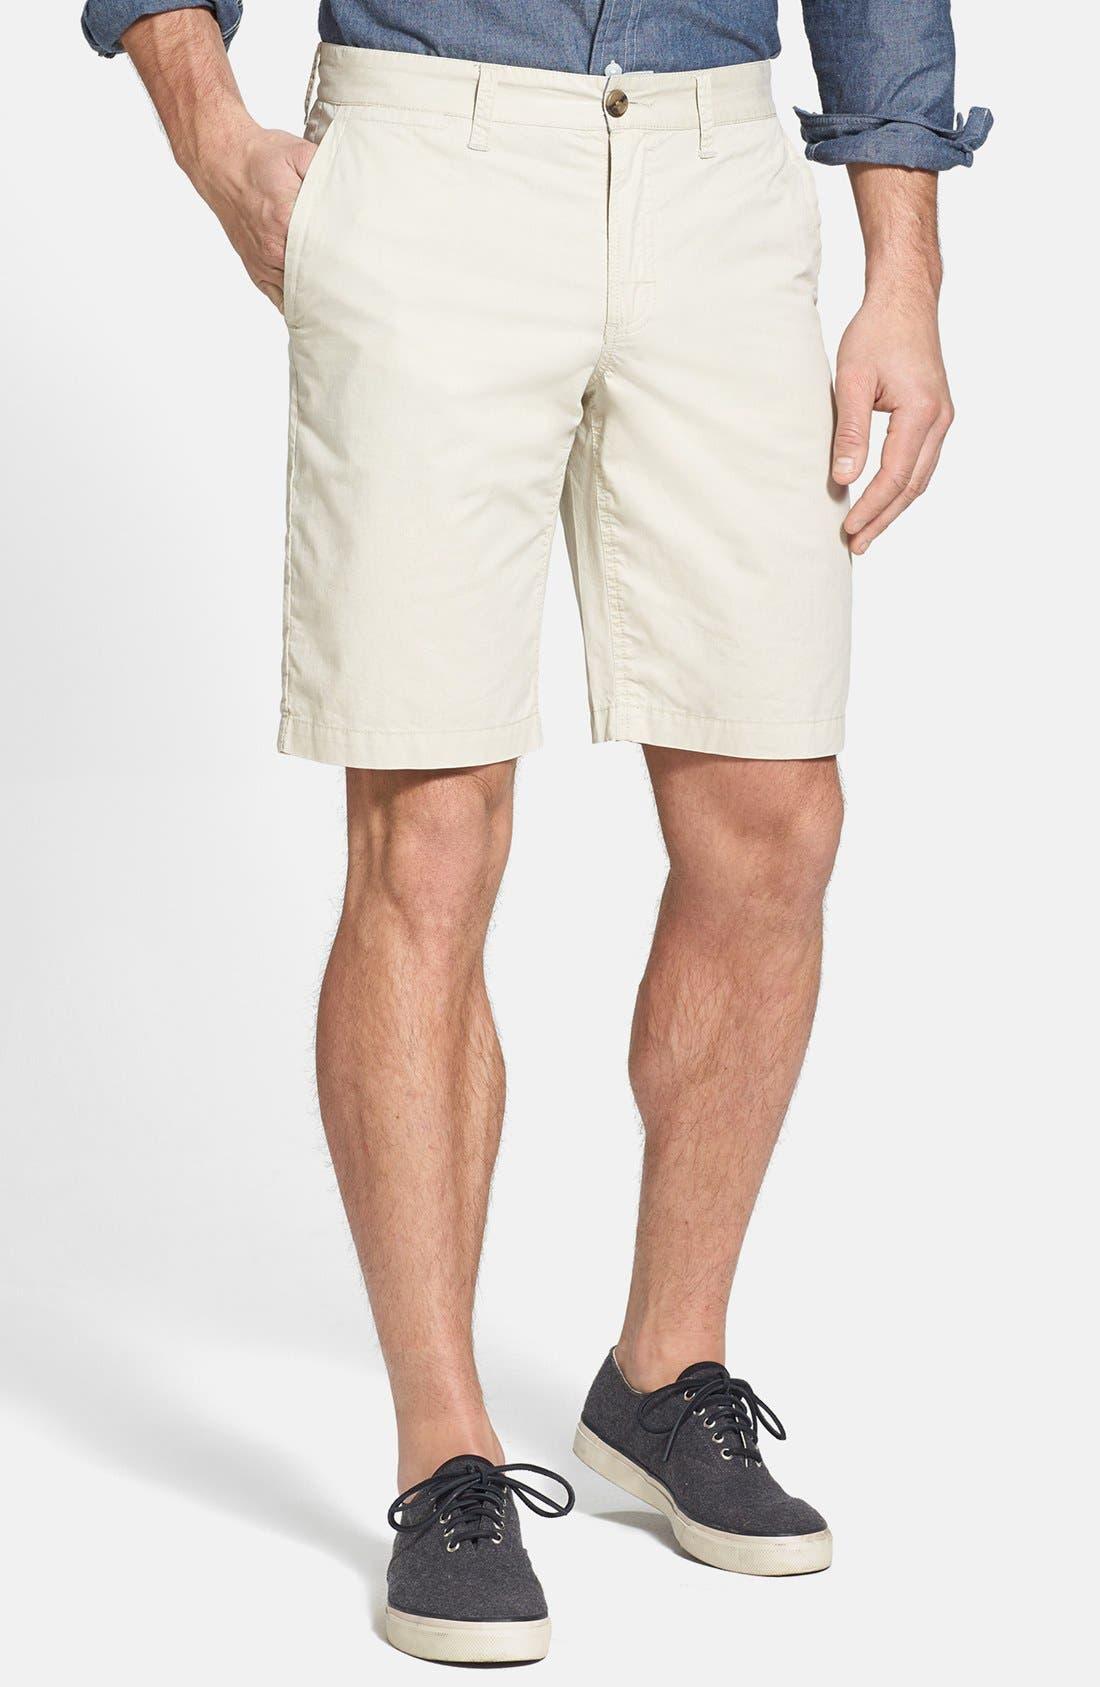 Alternate Image 1 Selected - 1901 'Eastport' Shorts